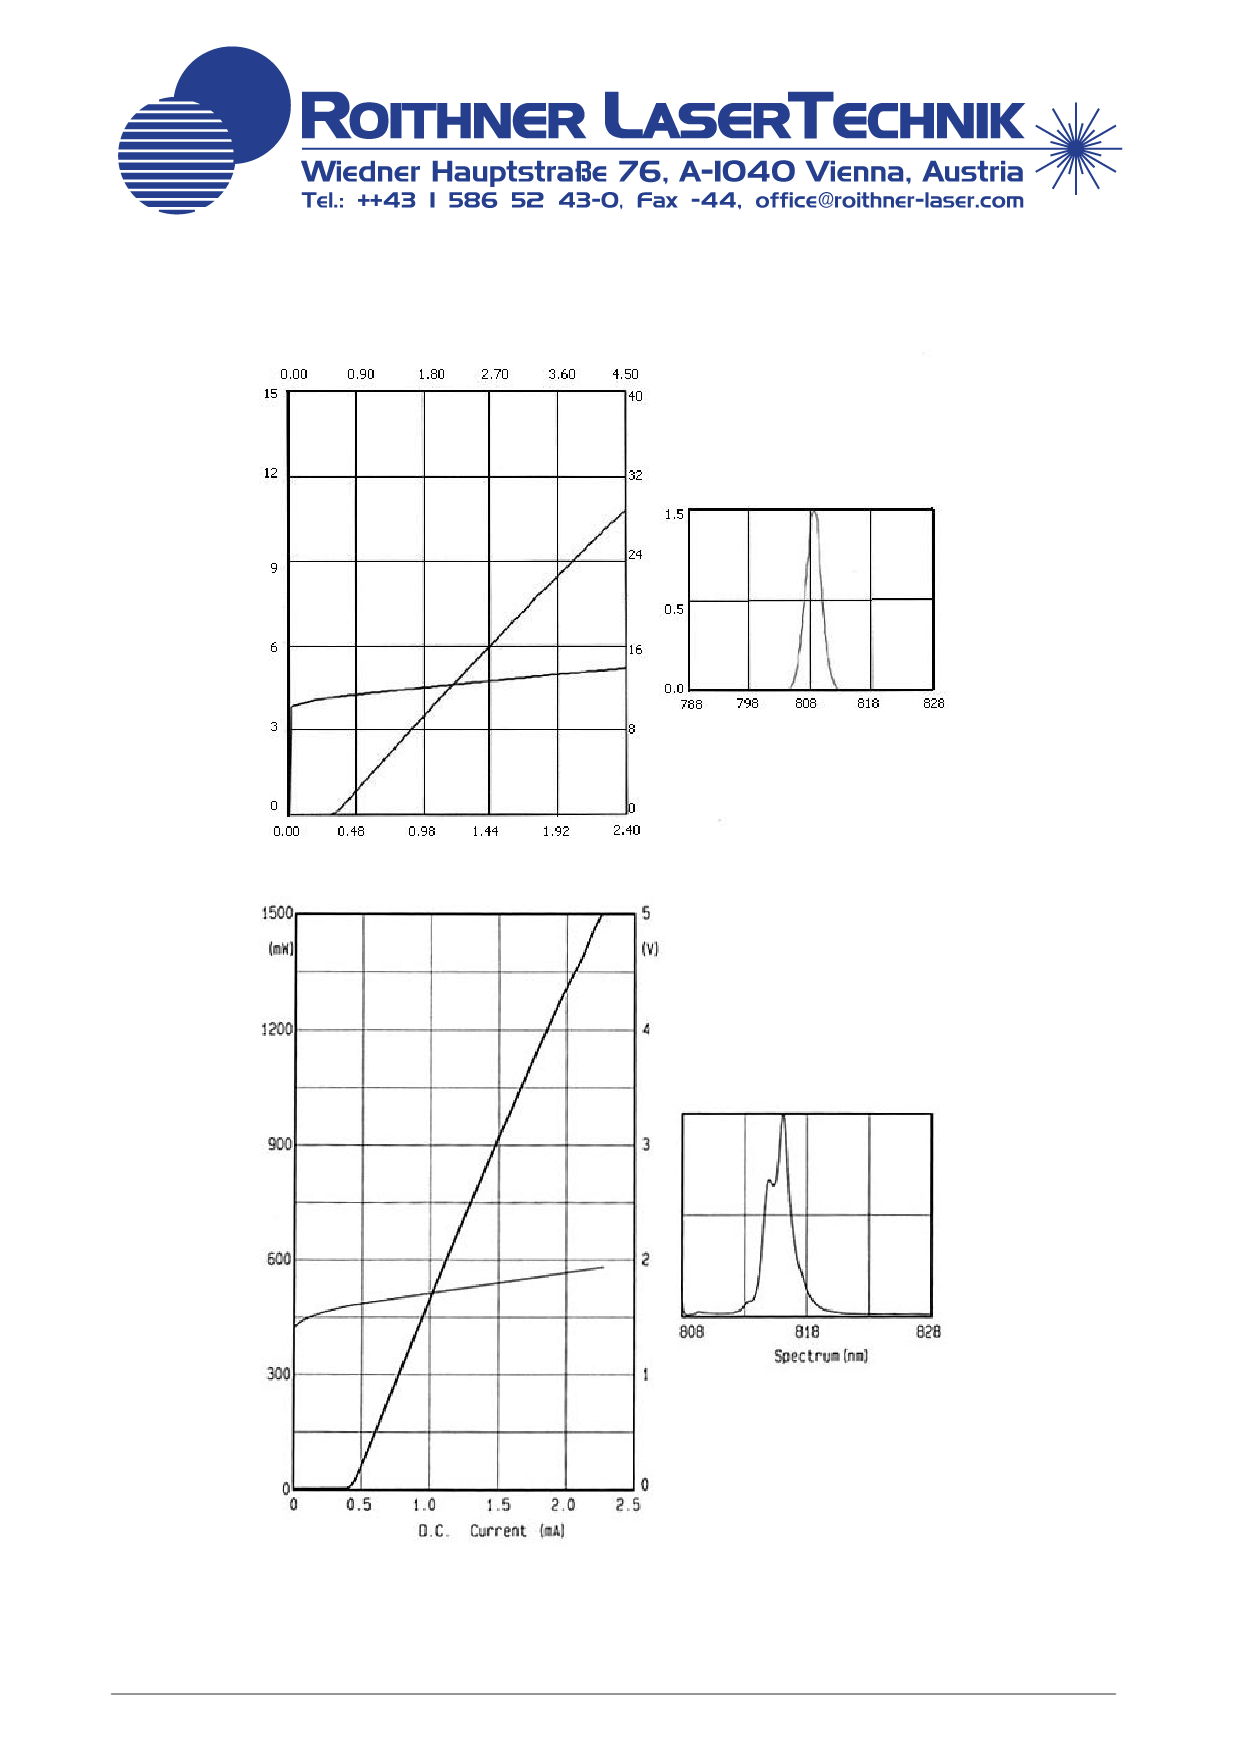 G081PU1750M pdf, 電子部品, 半導体, ピン配列